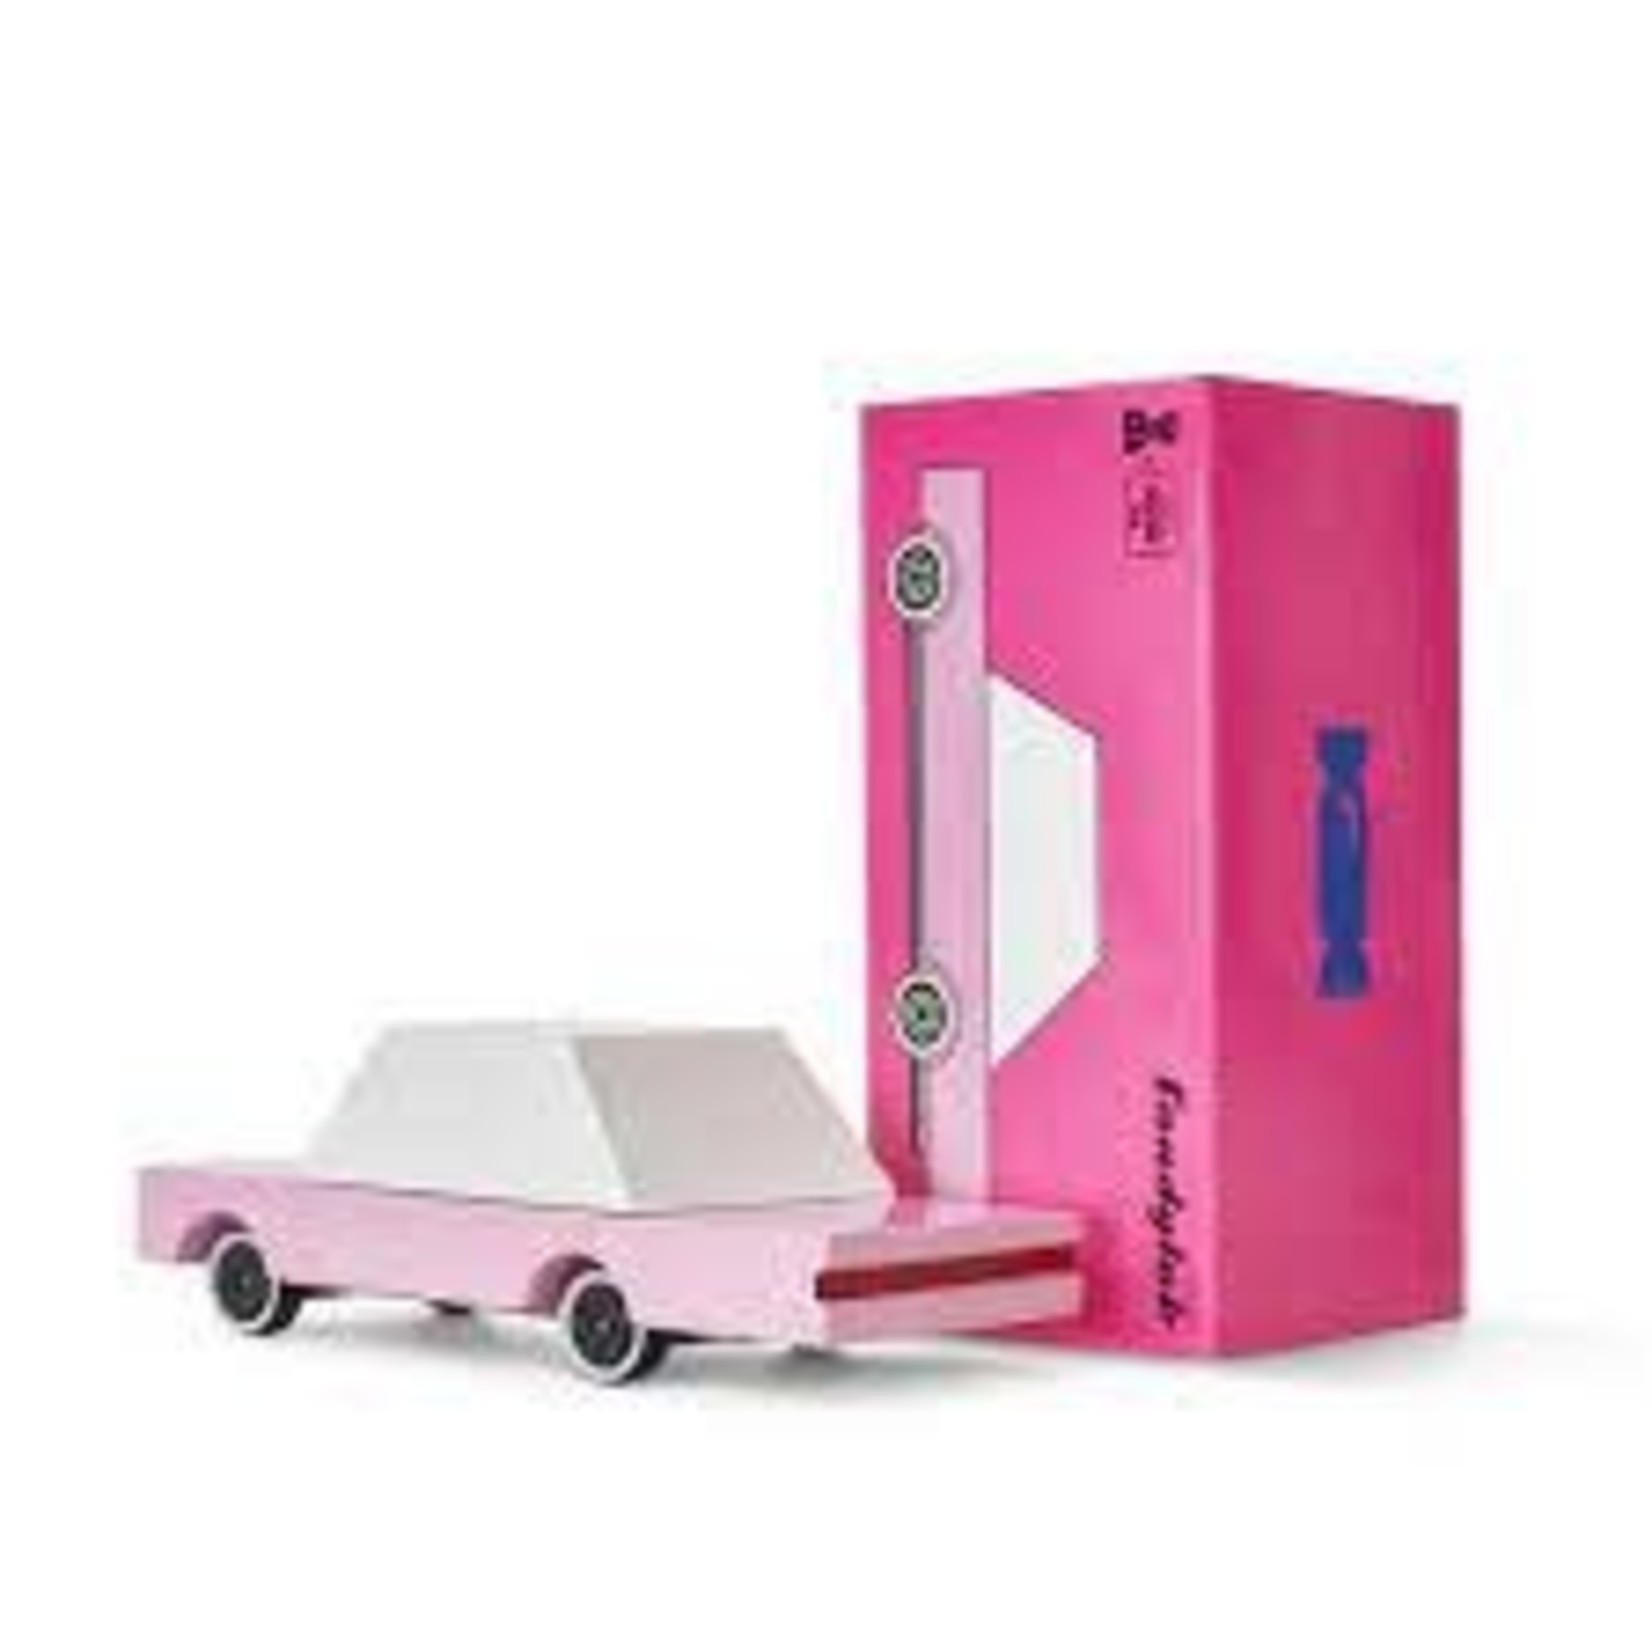 Candylab Toys Pink Candycar